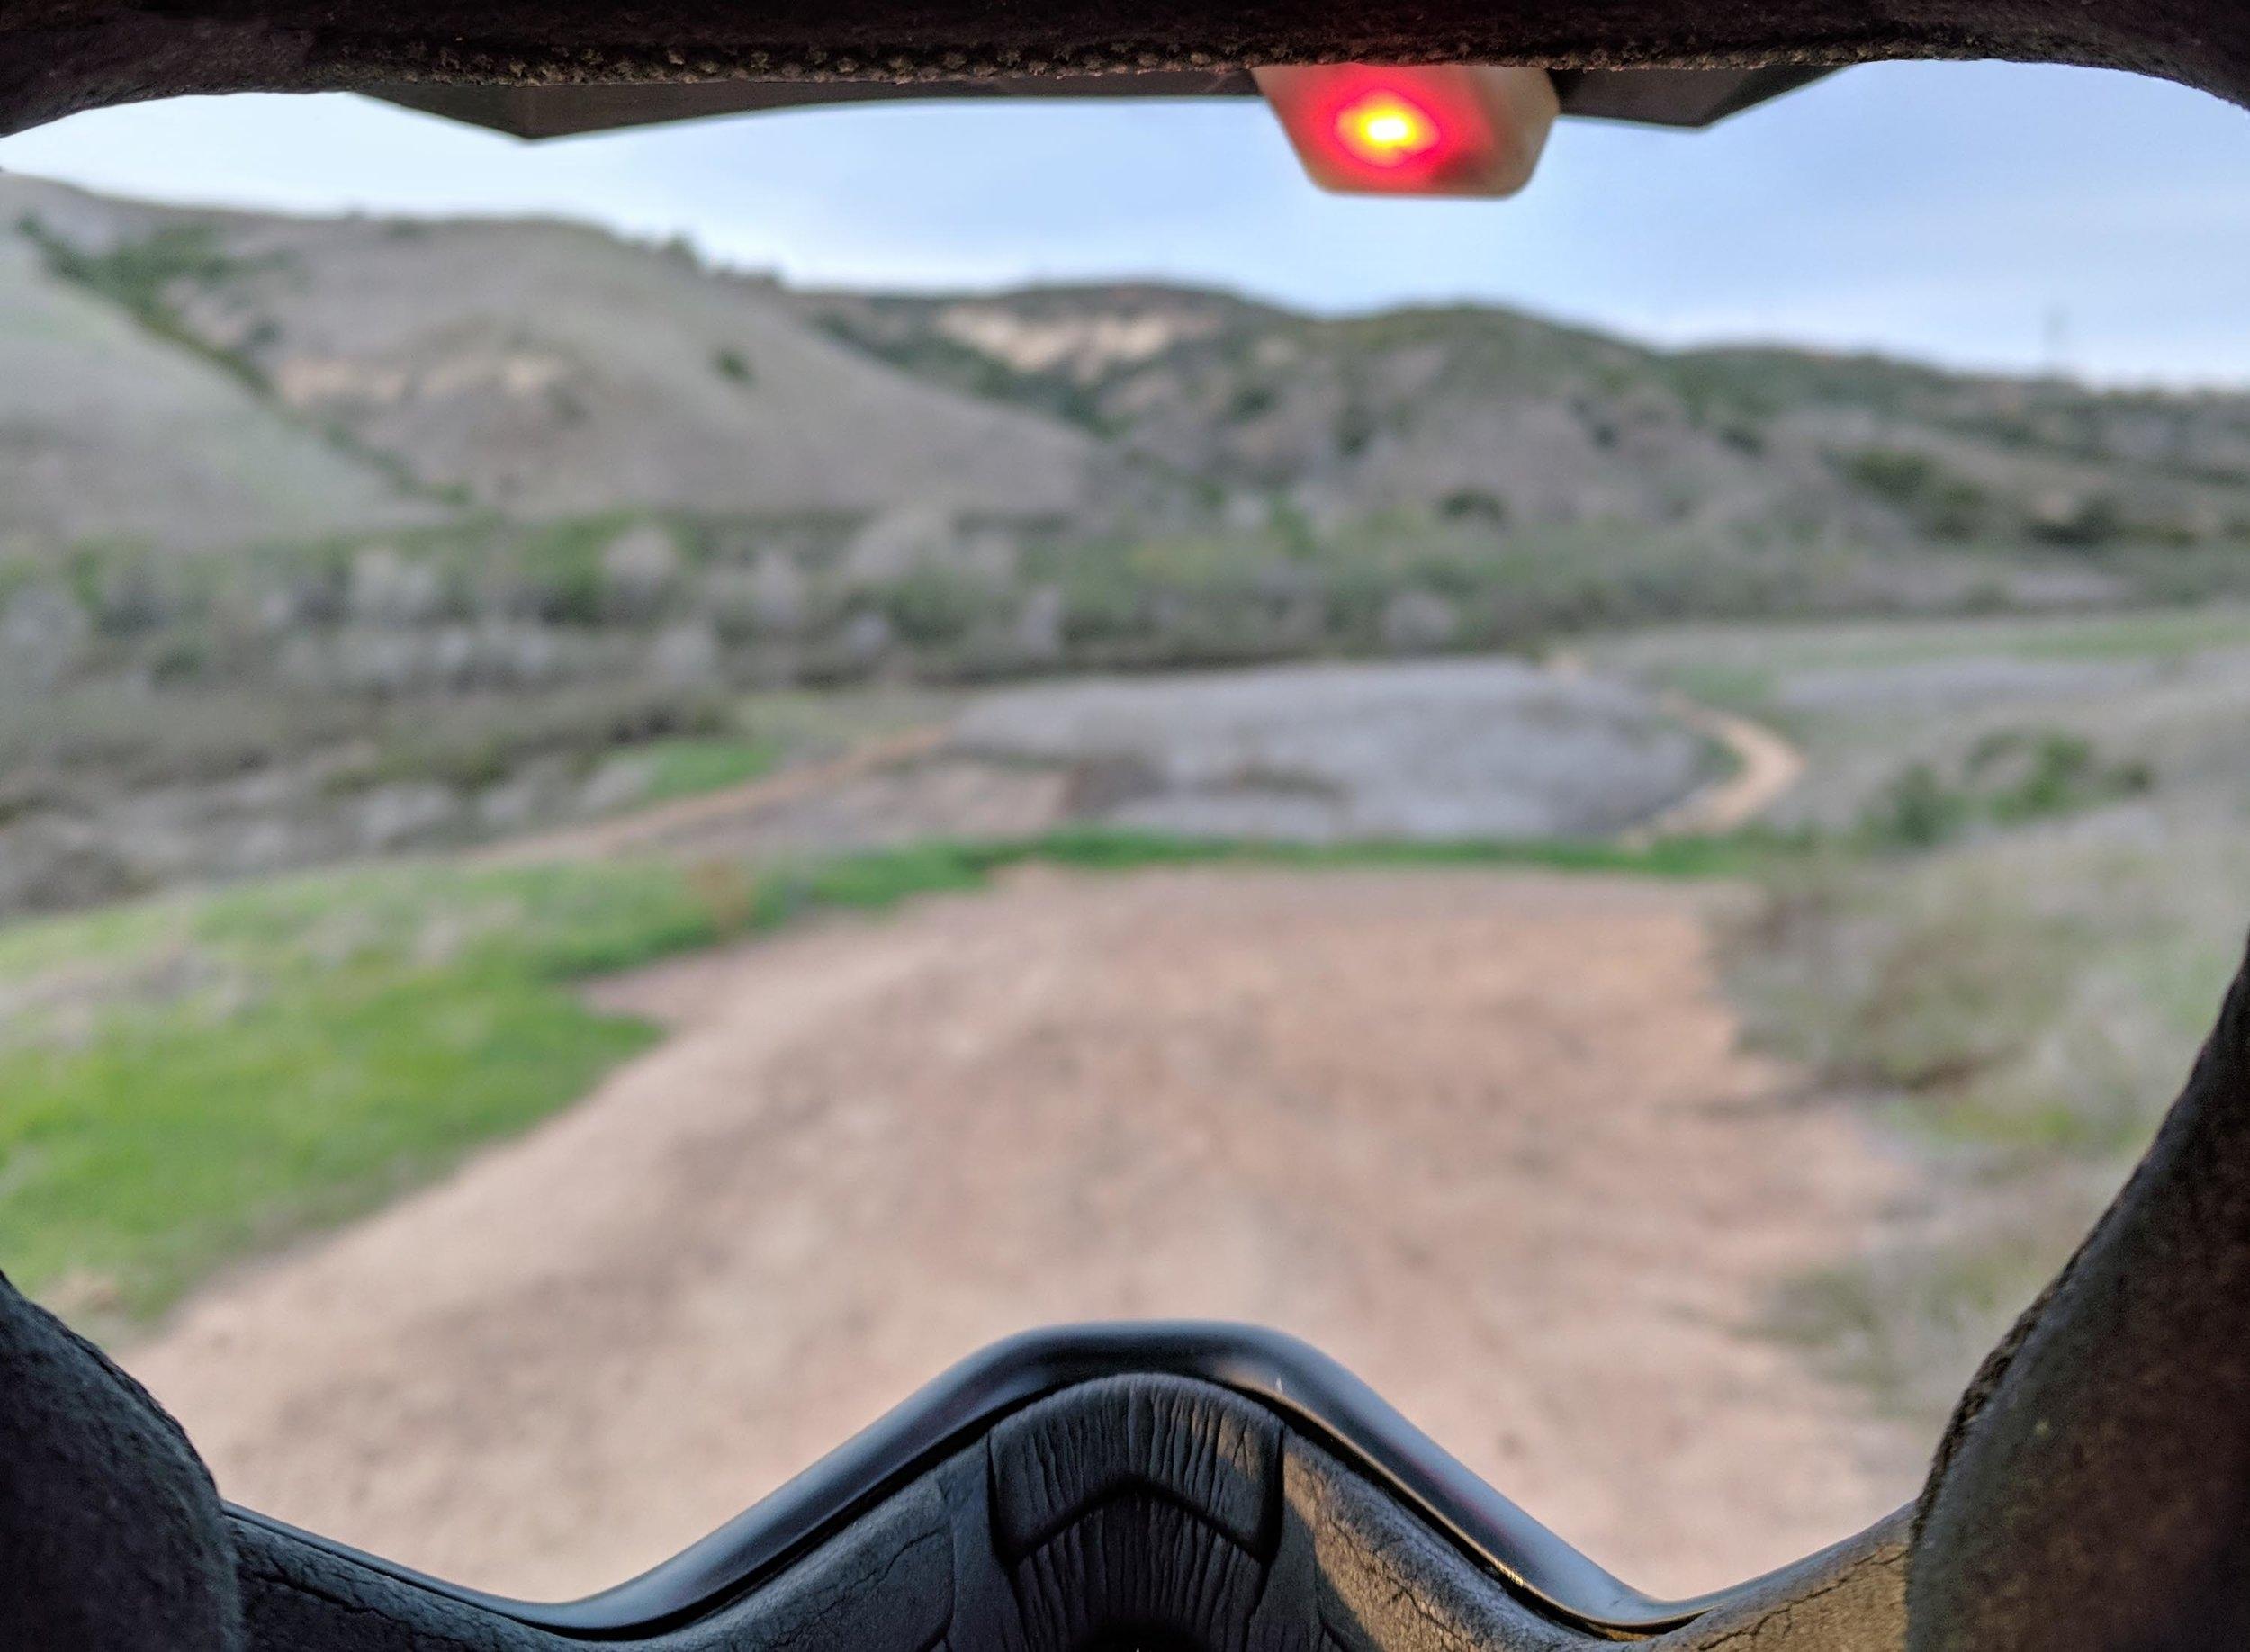 Smashlaps along for the ride at Rancho Penasquitos, San Diego.